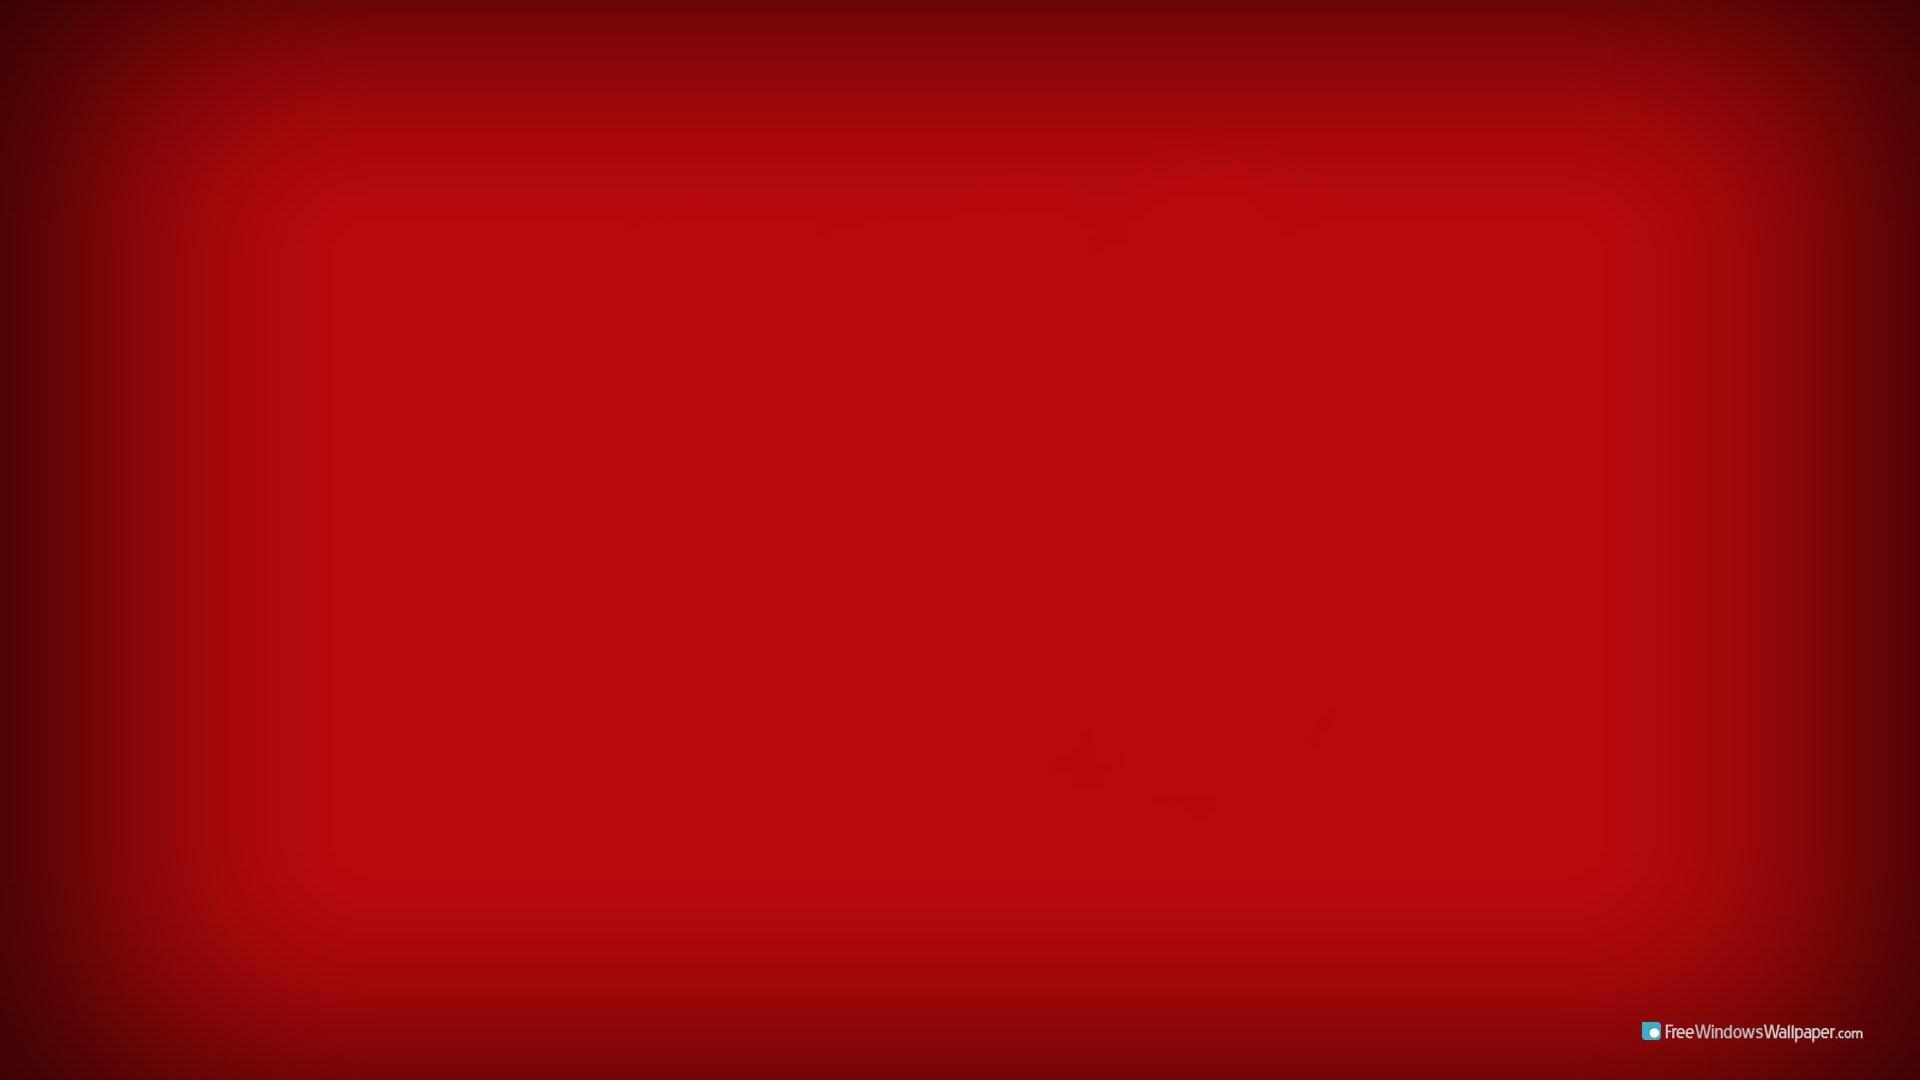 windows7desktopwallpaperscomwallpaper1920x1080solid red wallpaper 1920x1080